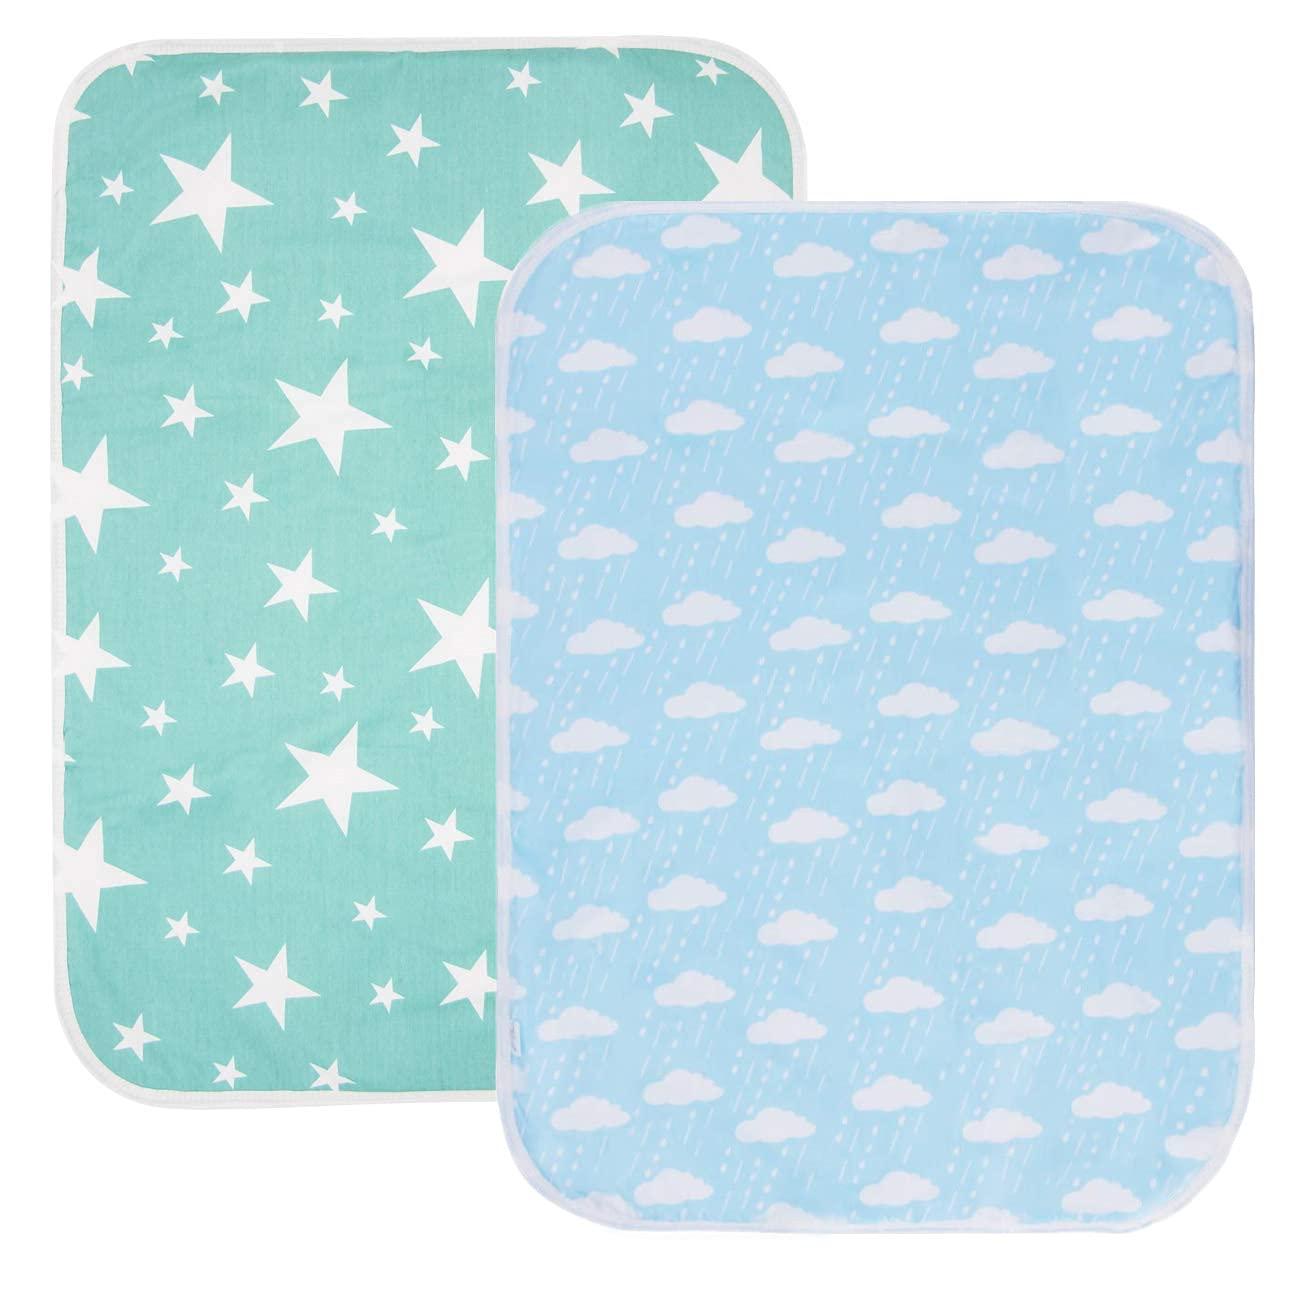 Waterproof Baby depot Diaper Changing Function Change Multi Pad service